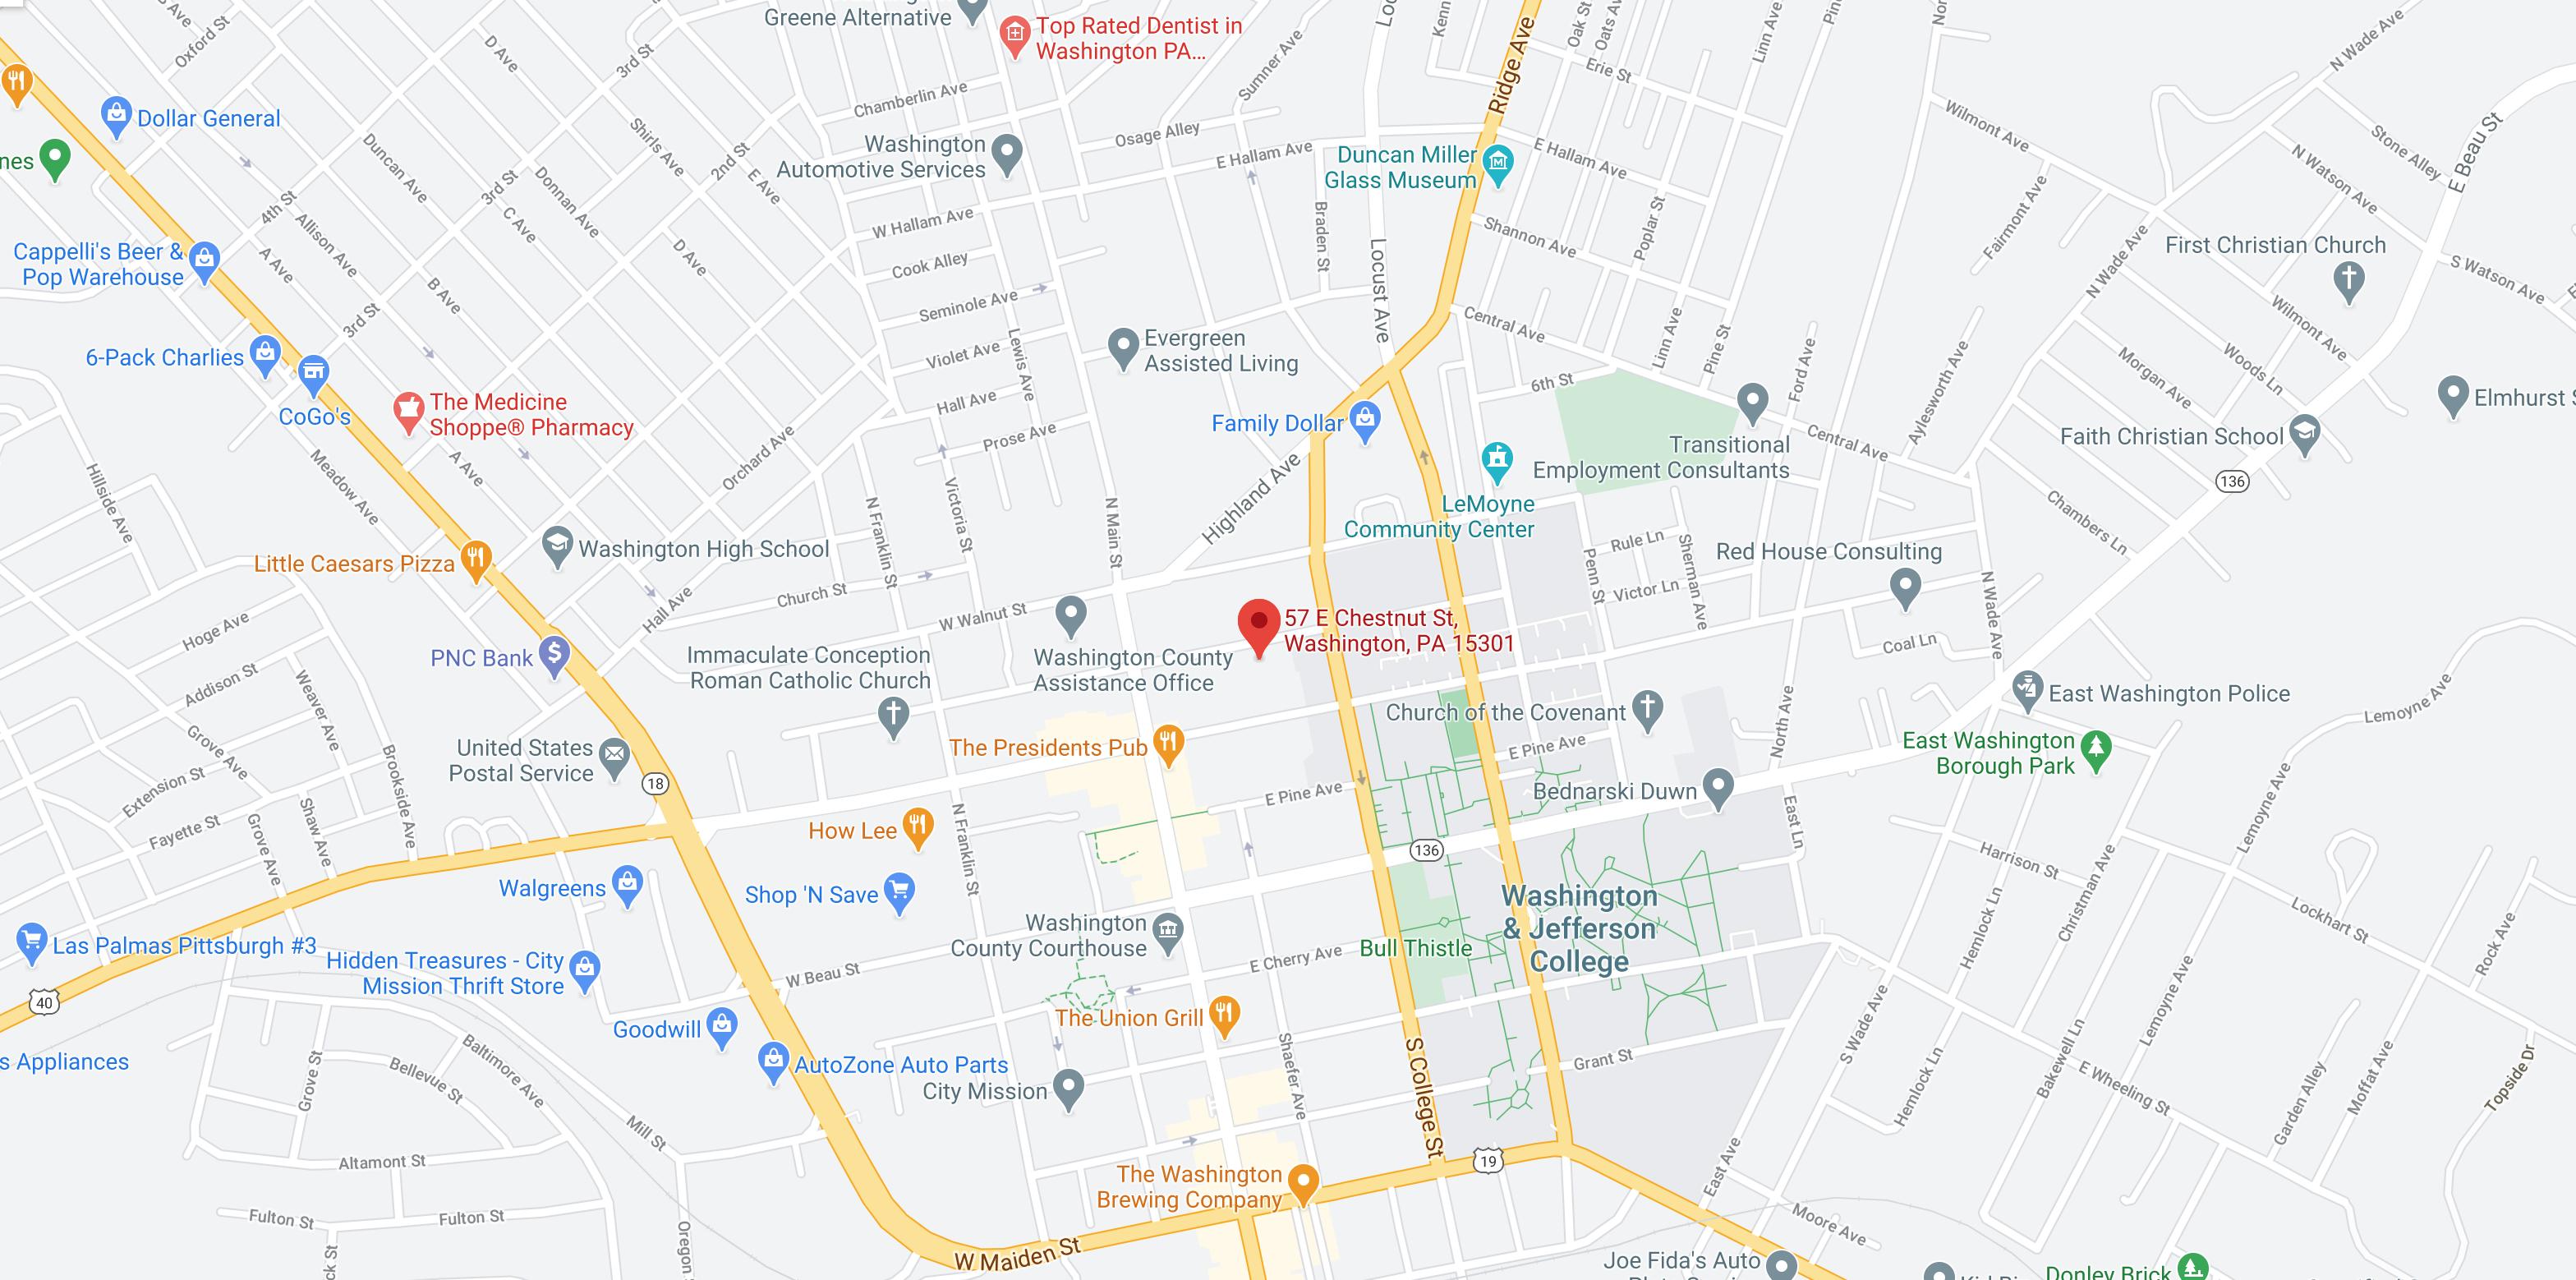 Map of Washington, PA showing the IGNITE location at 57 E Chestnut St, Washington, PA 15301